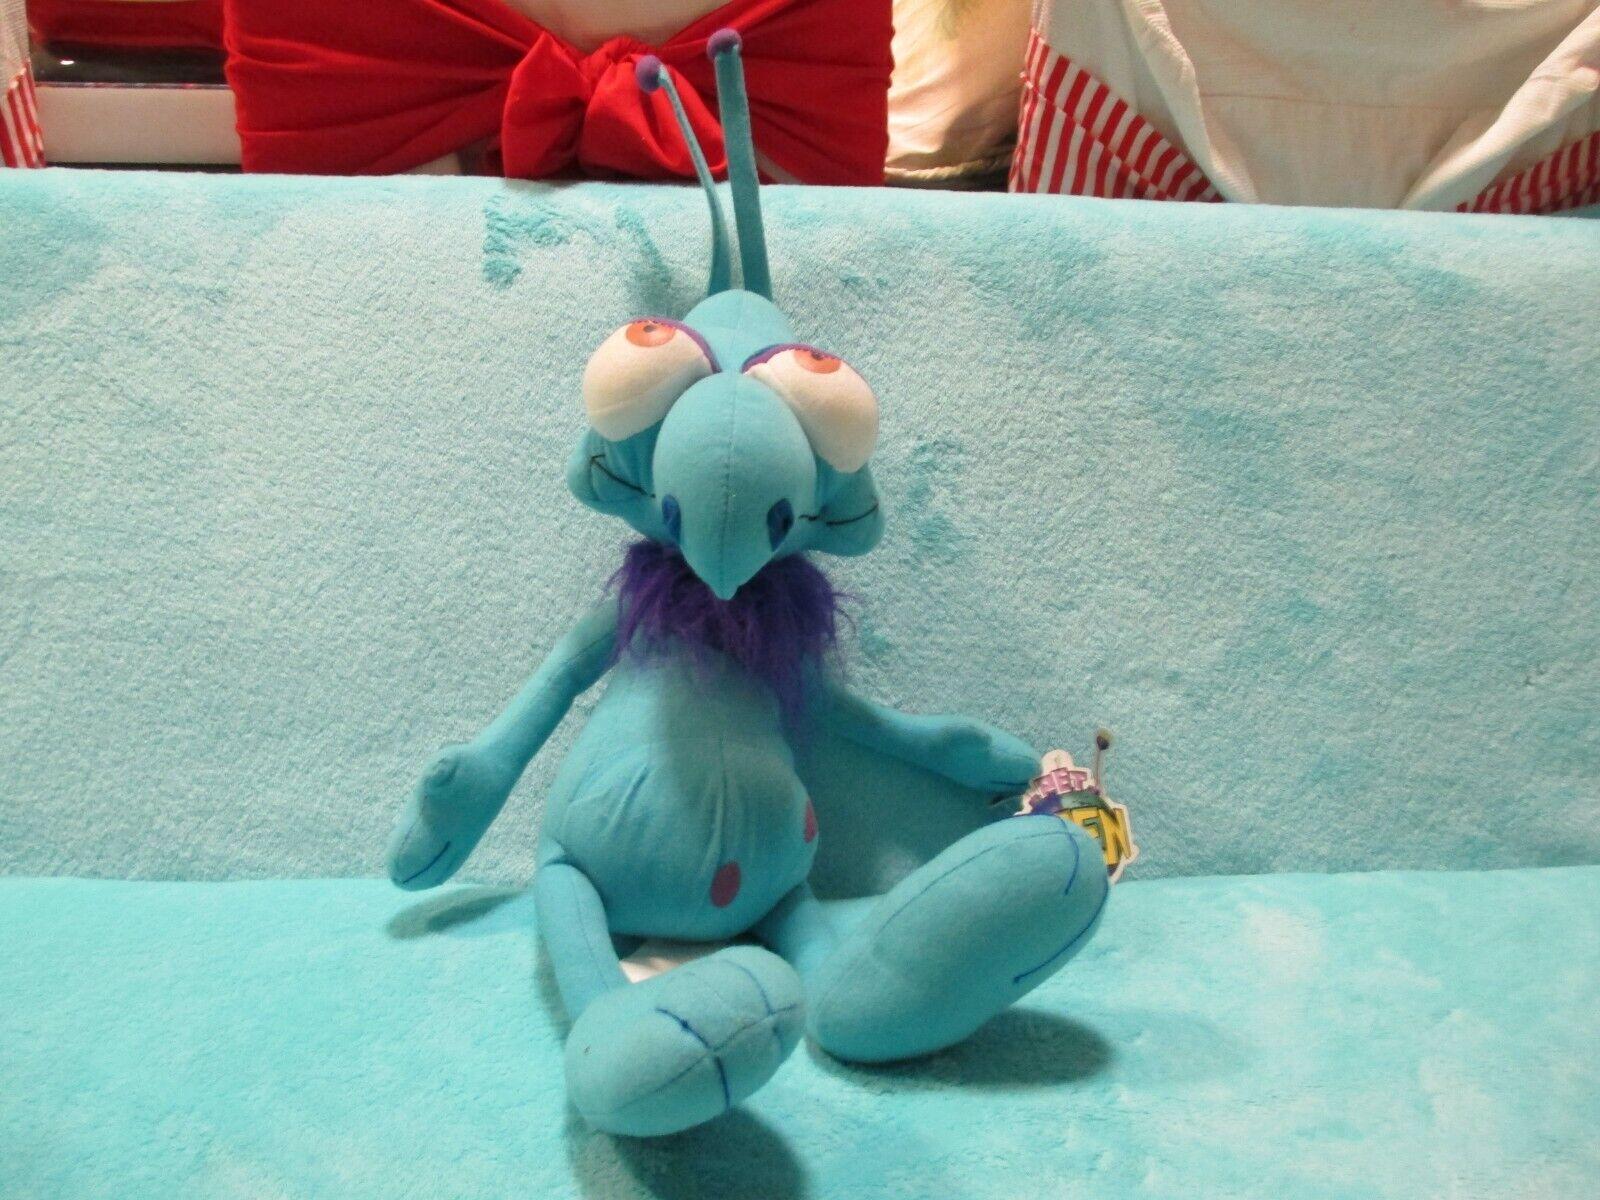 BNWT 2006 Taffy Productions PET ALIEN - SWANKY Large Soft Plush 20  Toy Network